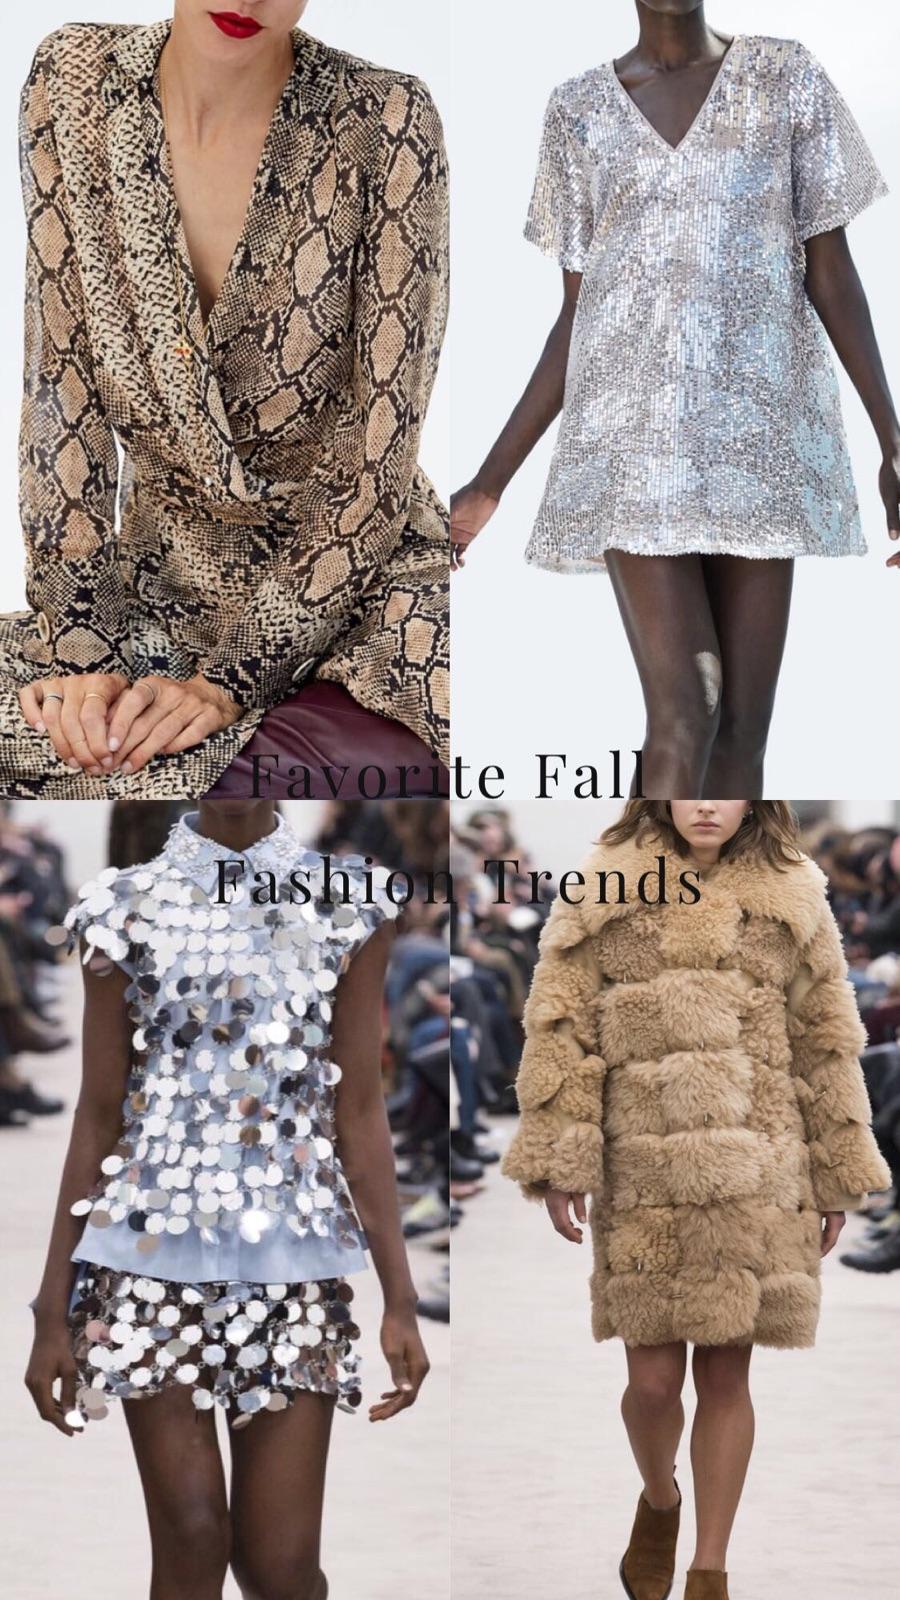 Favorite Fall Fashion Trends, 2018